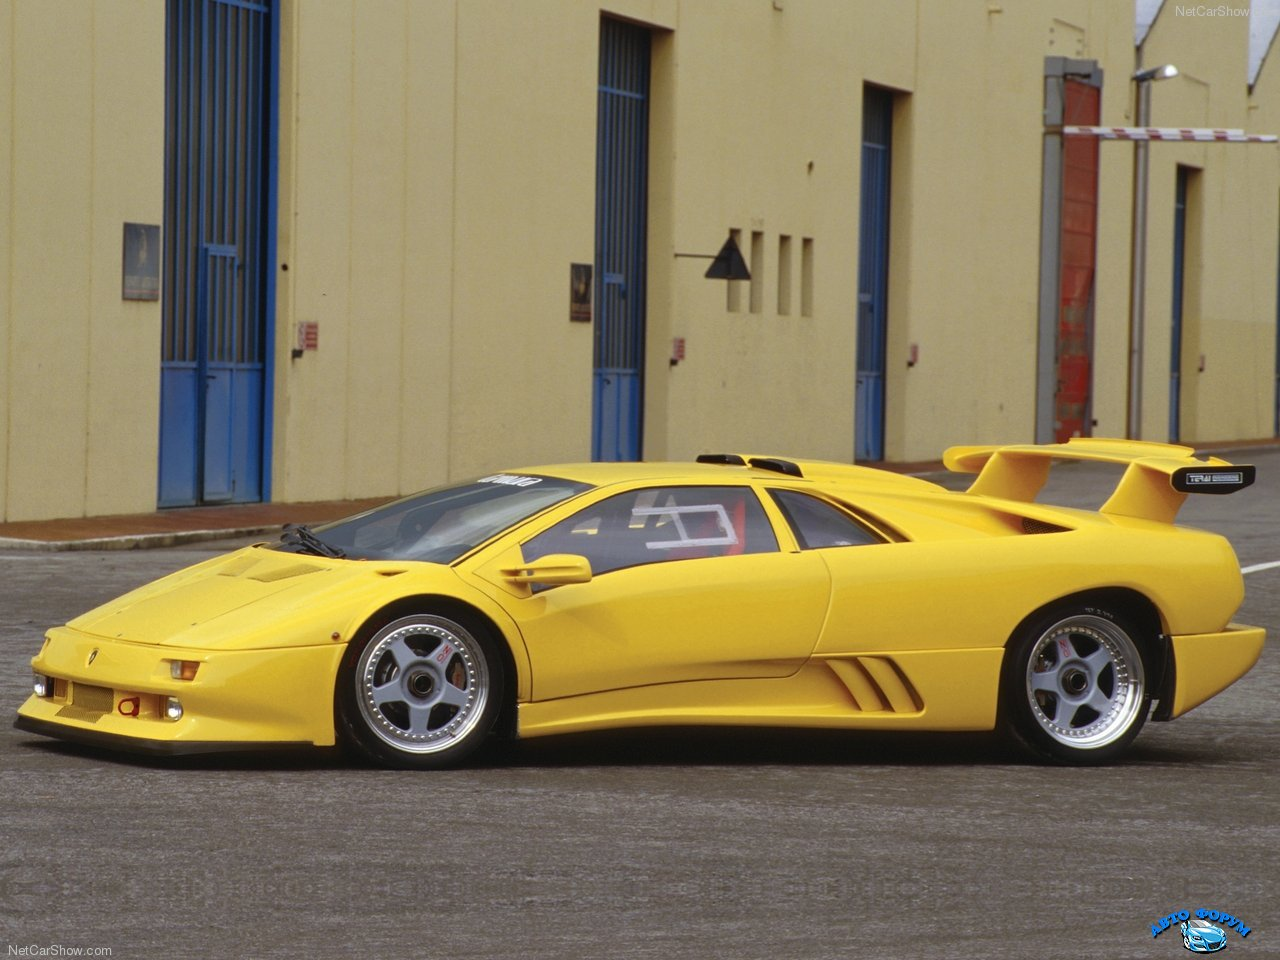 Lamborghini-Diablo_Iota_1995_1280x960_wallpaper_02.jpg